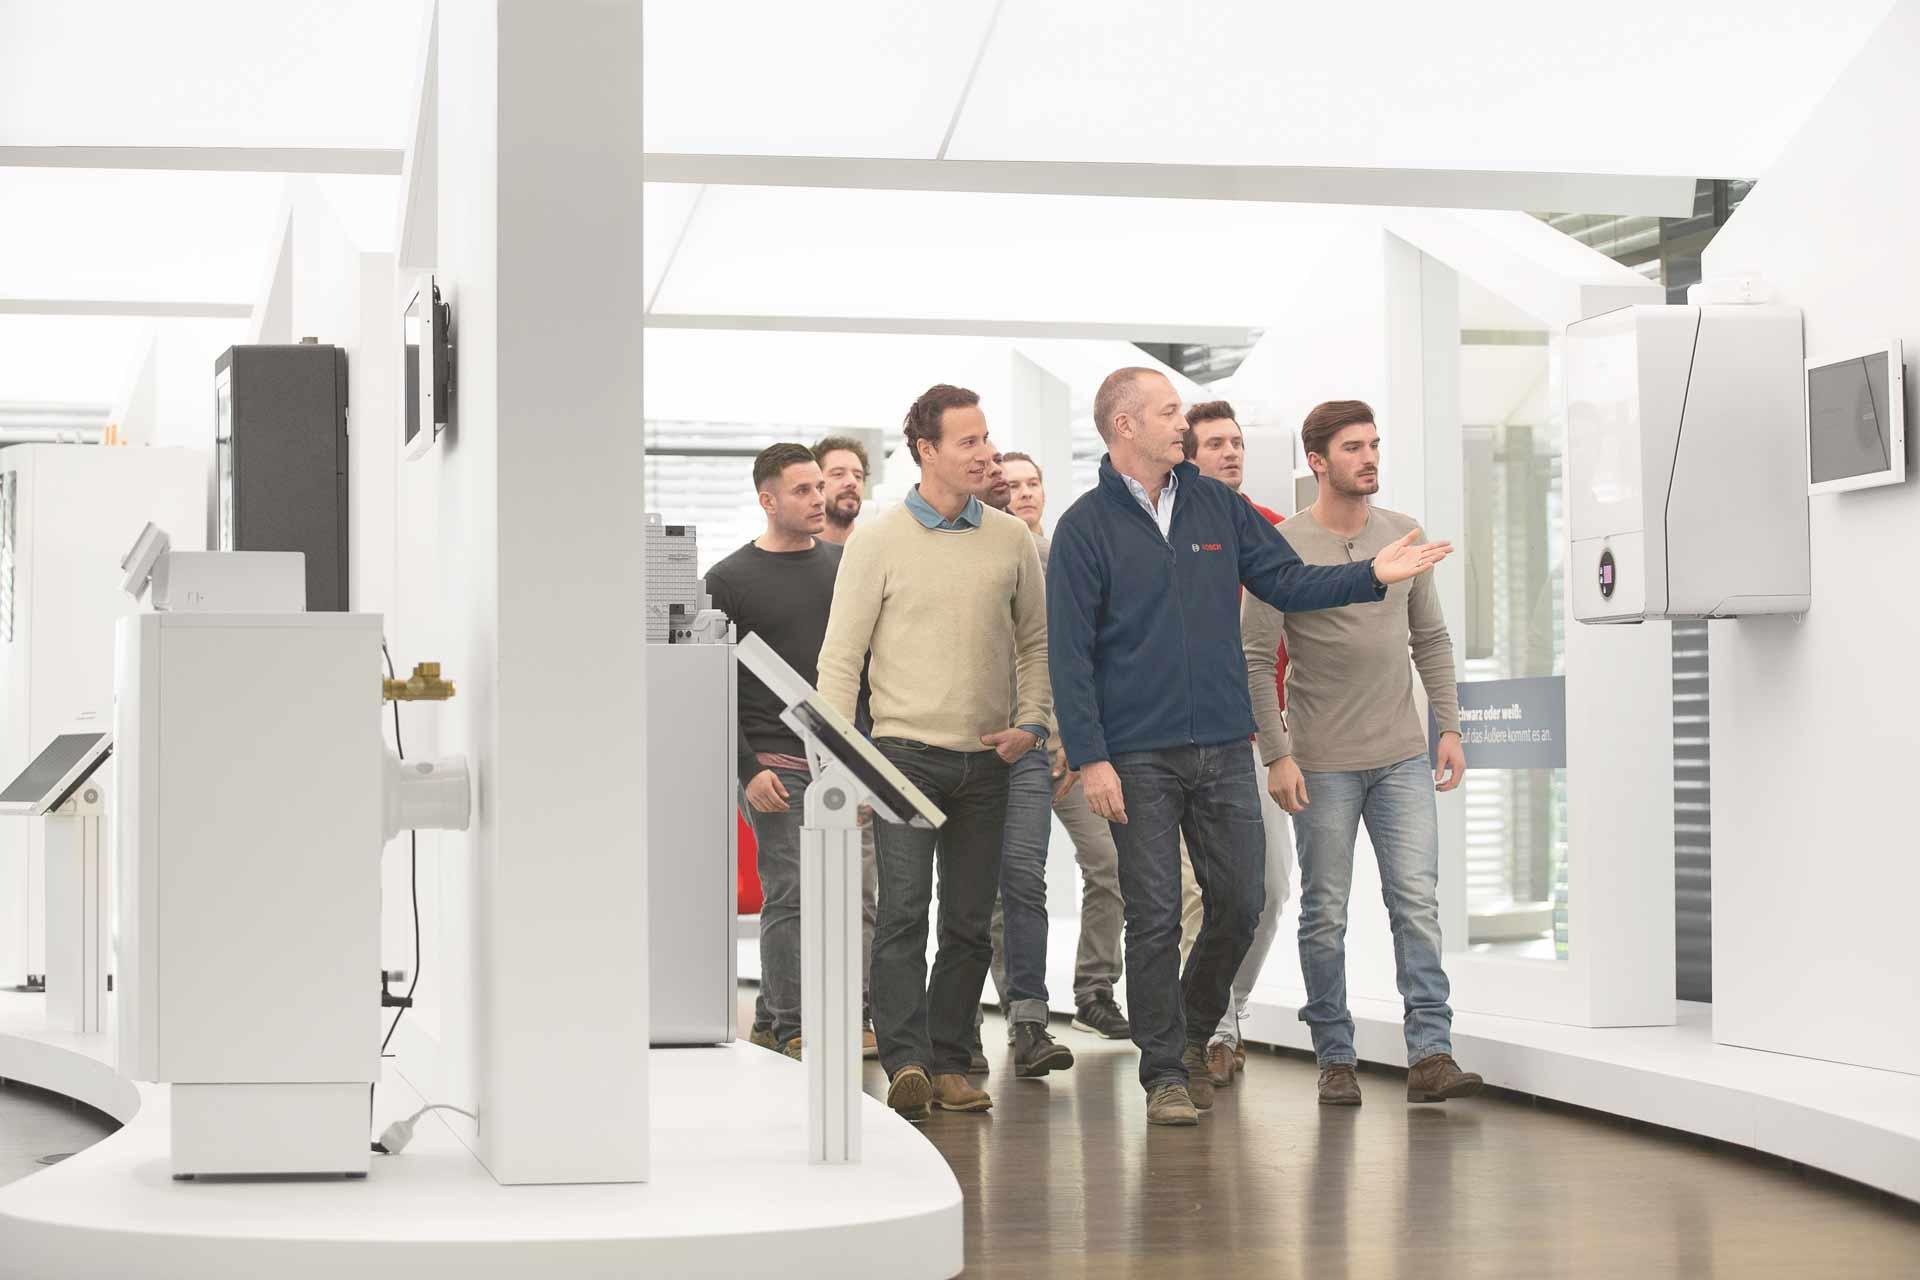 Schulungen bei Bosch Thermotechnik